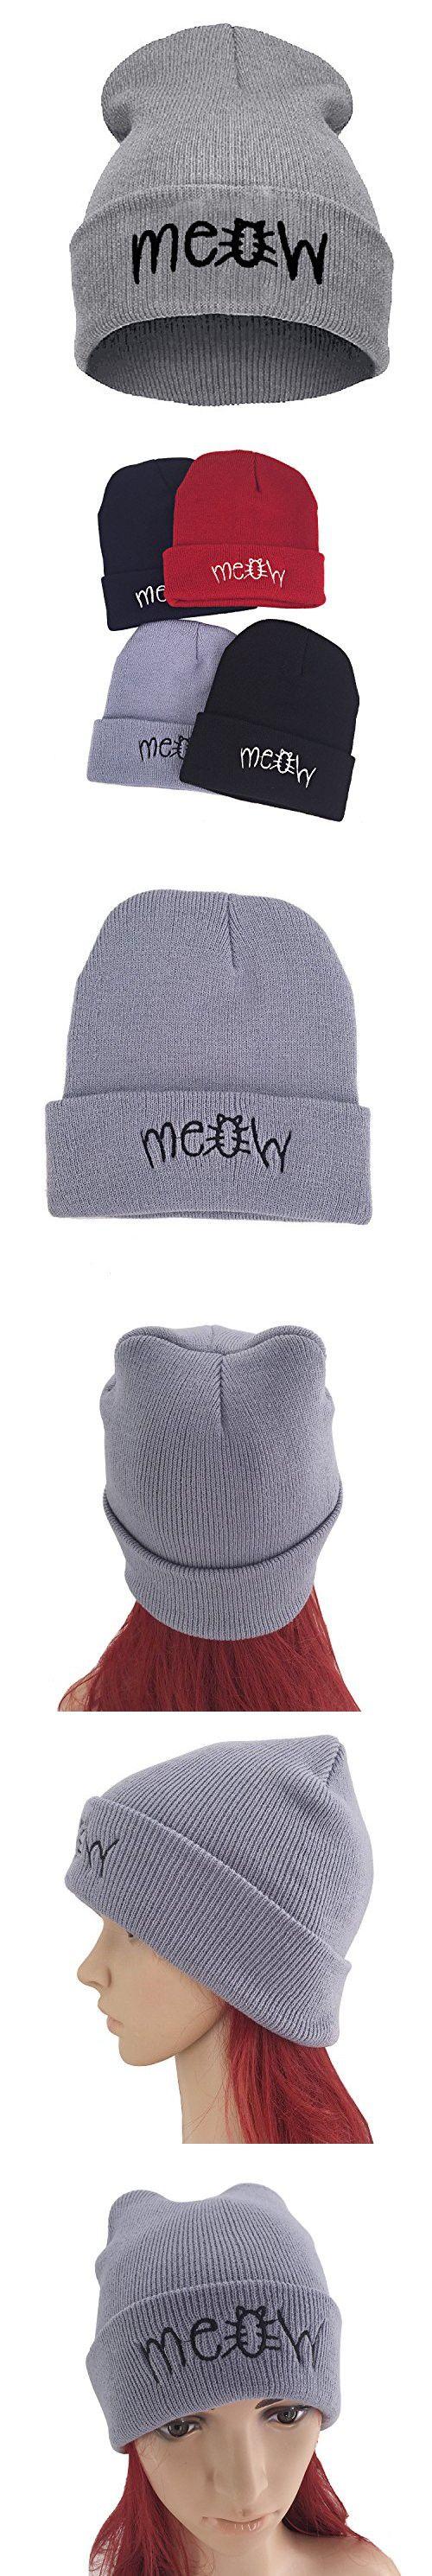 Beanie Hat for women, Winter Hip Hot Knit Cap Beanie Skull Hats for women/girls/teens - Cute Hats with letter 'Meow' - Grey Crochet Slouchy Hip-pop Hat